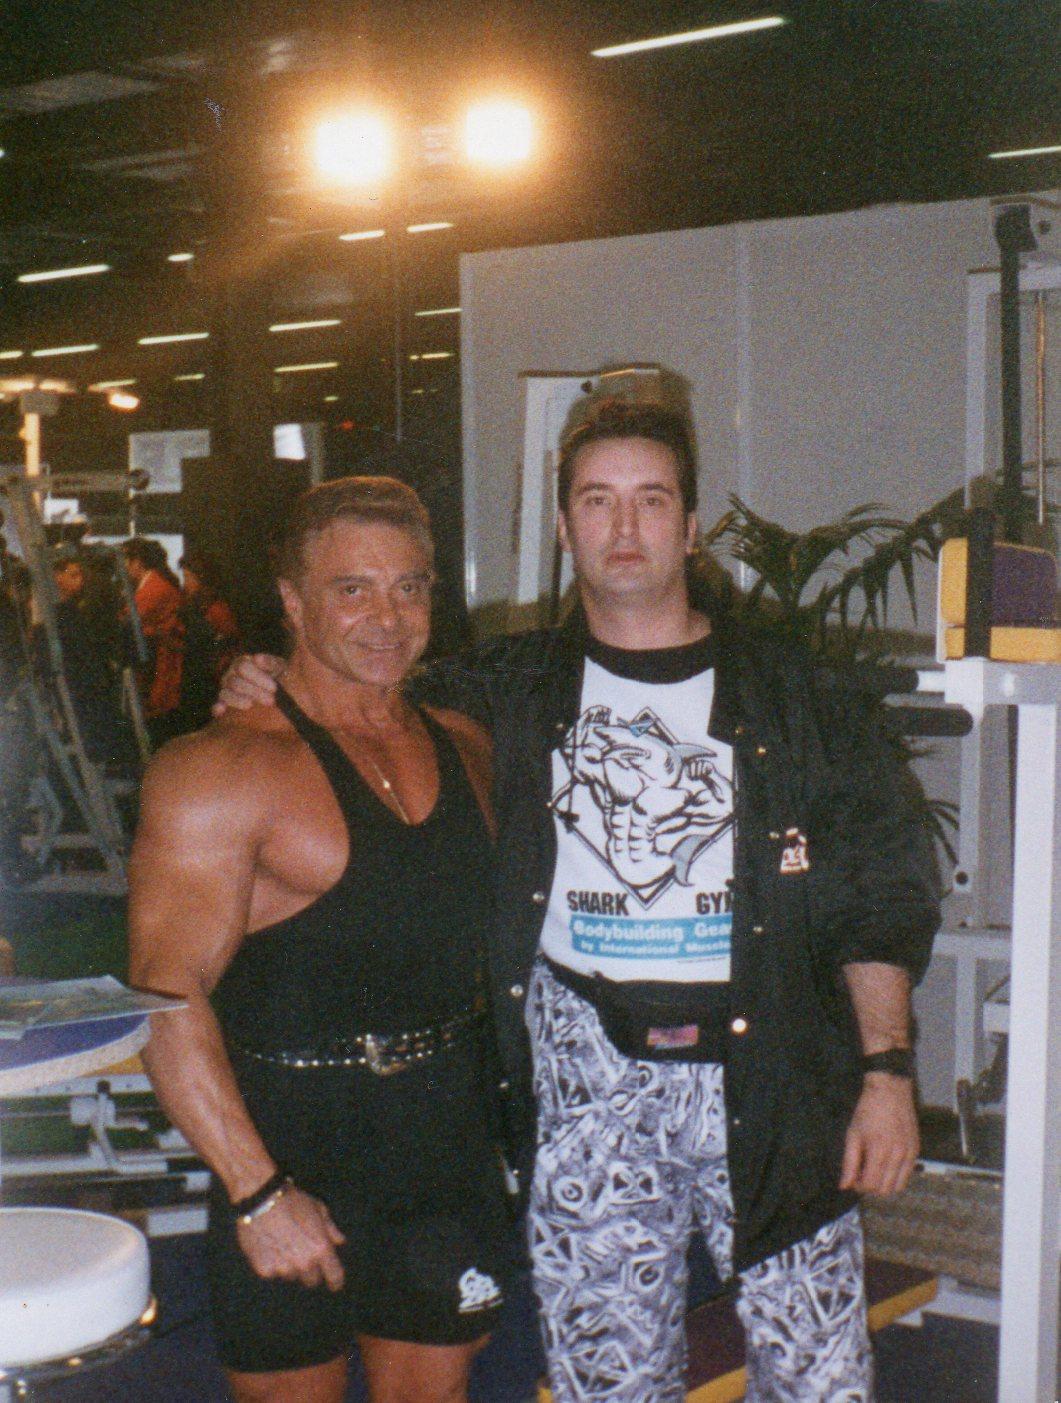 http://images.onlc.eu/muscle-catrinOEU//130607998282.jpg